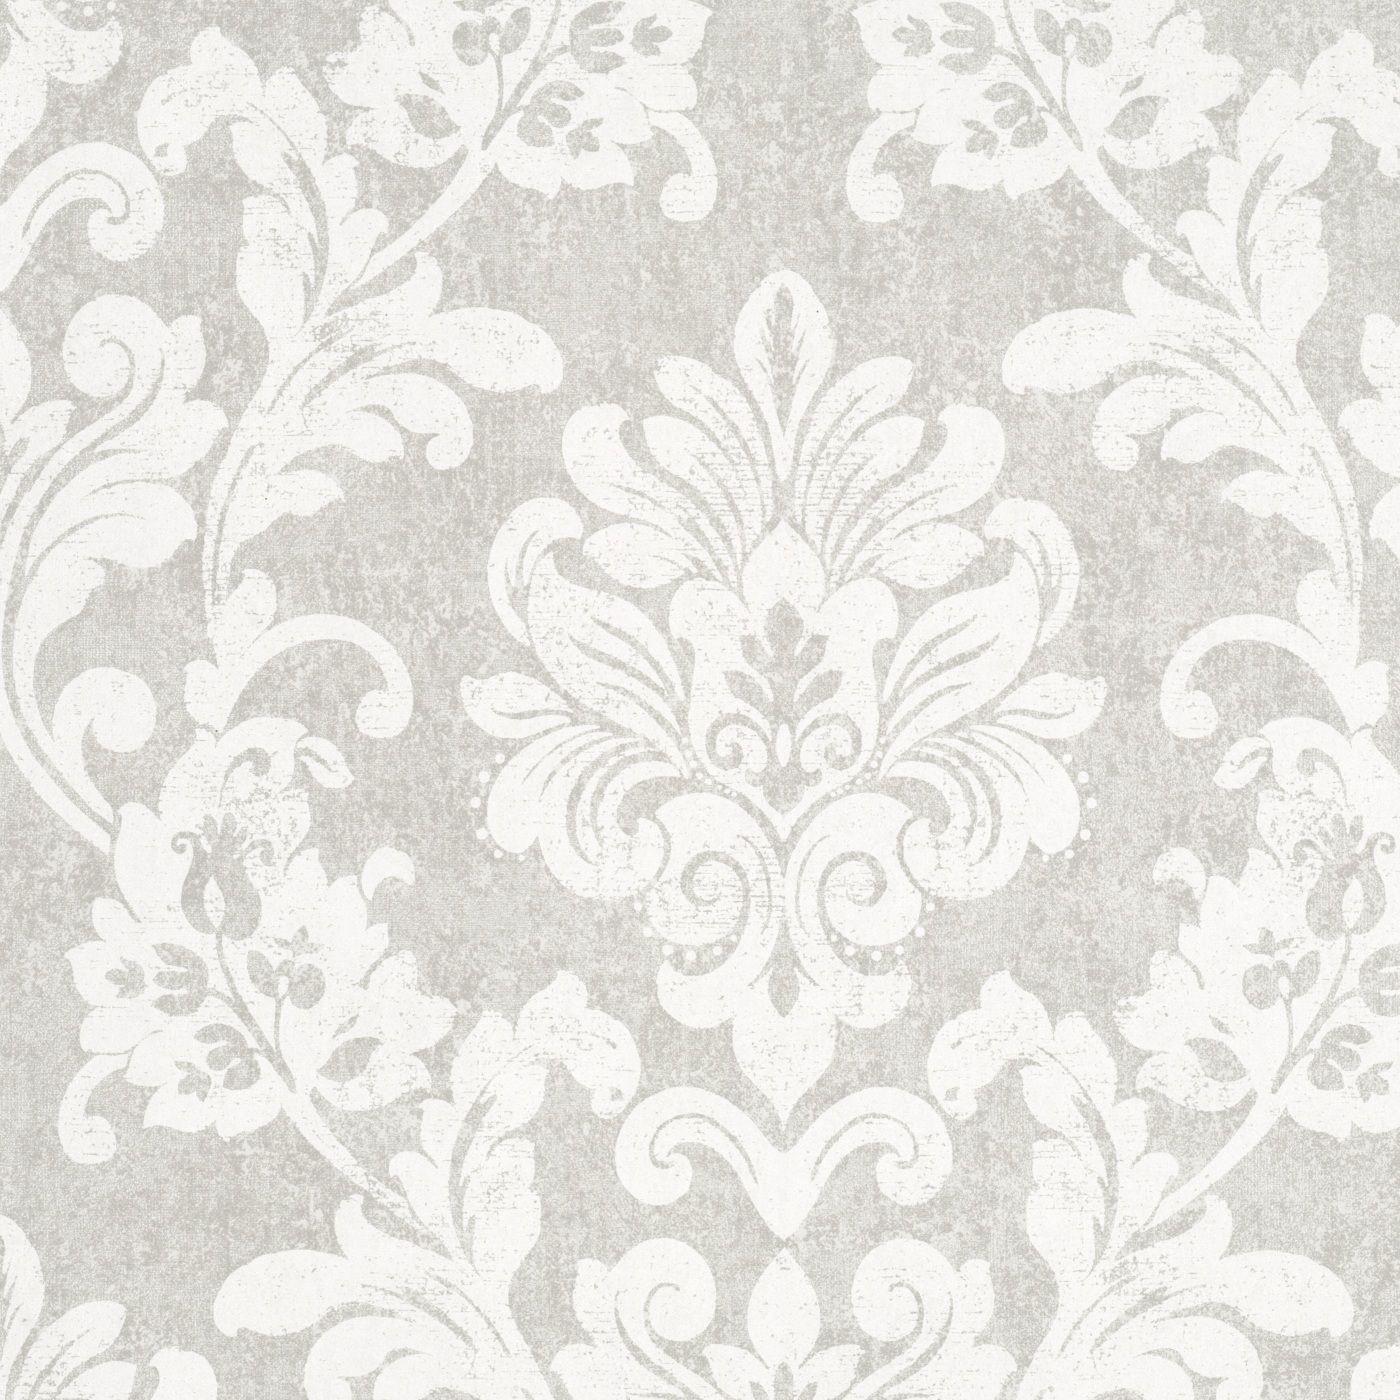 tapete vlies grau barock padua marburg 56152. Black Bedroom Furniture Sets. Home Design Ideas